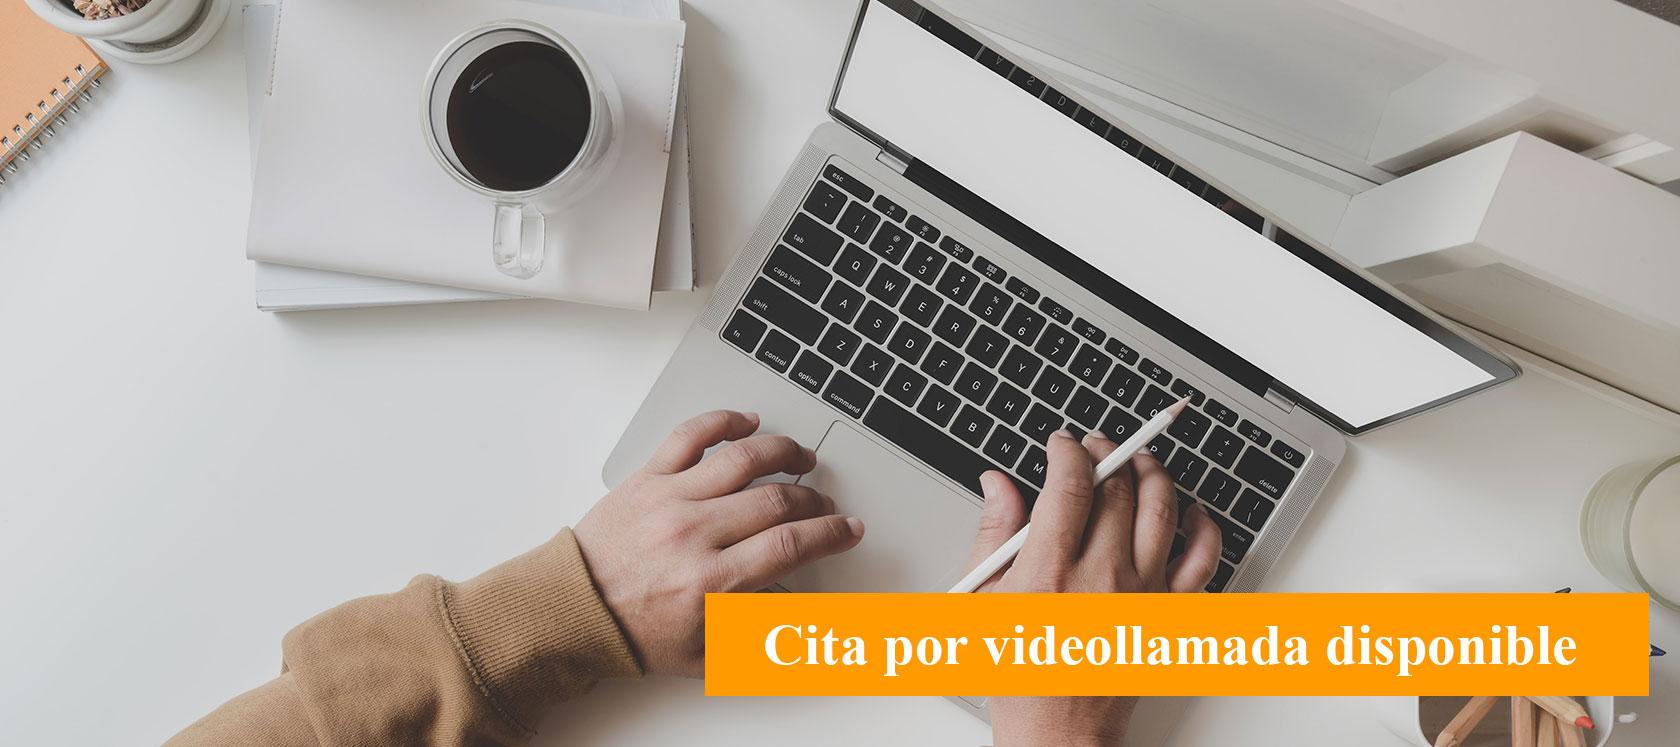 Celere-Mirabueno-obra-nueva-Córdoba